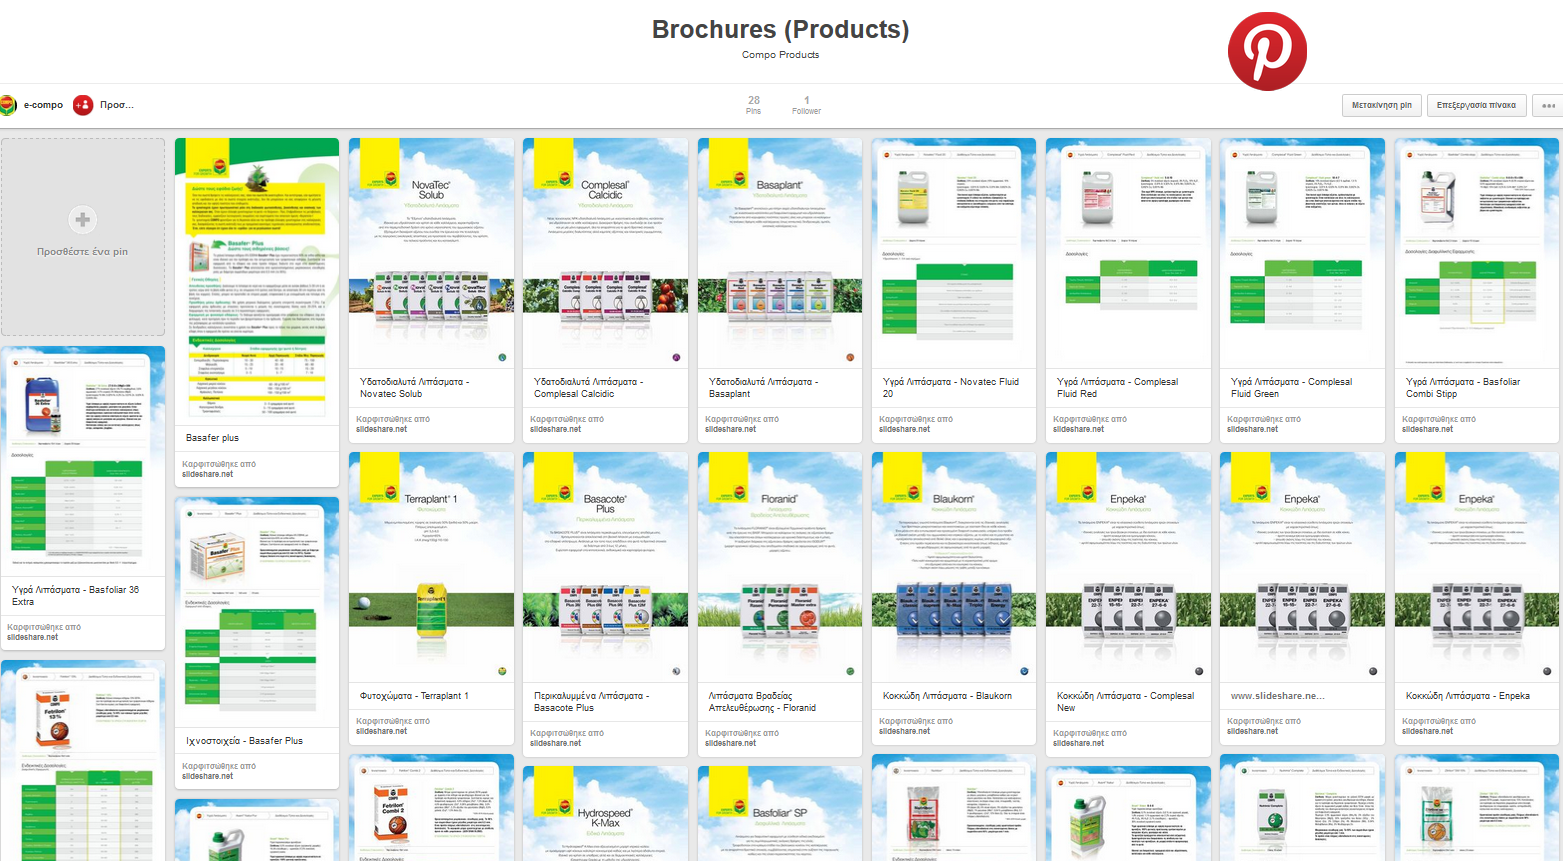 https://www.pinterest.com/eCompogr/brochures-products/